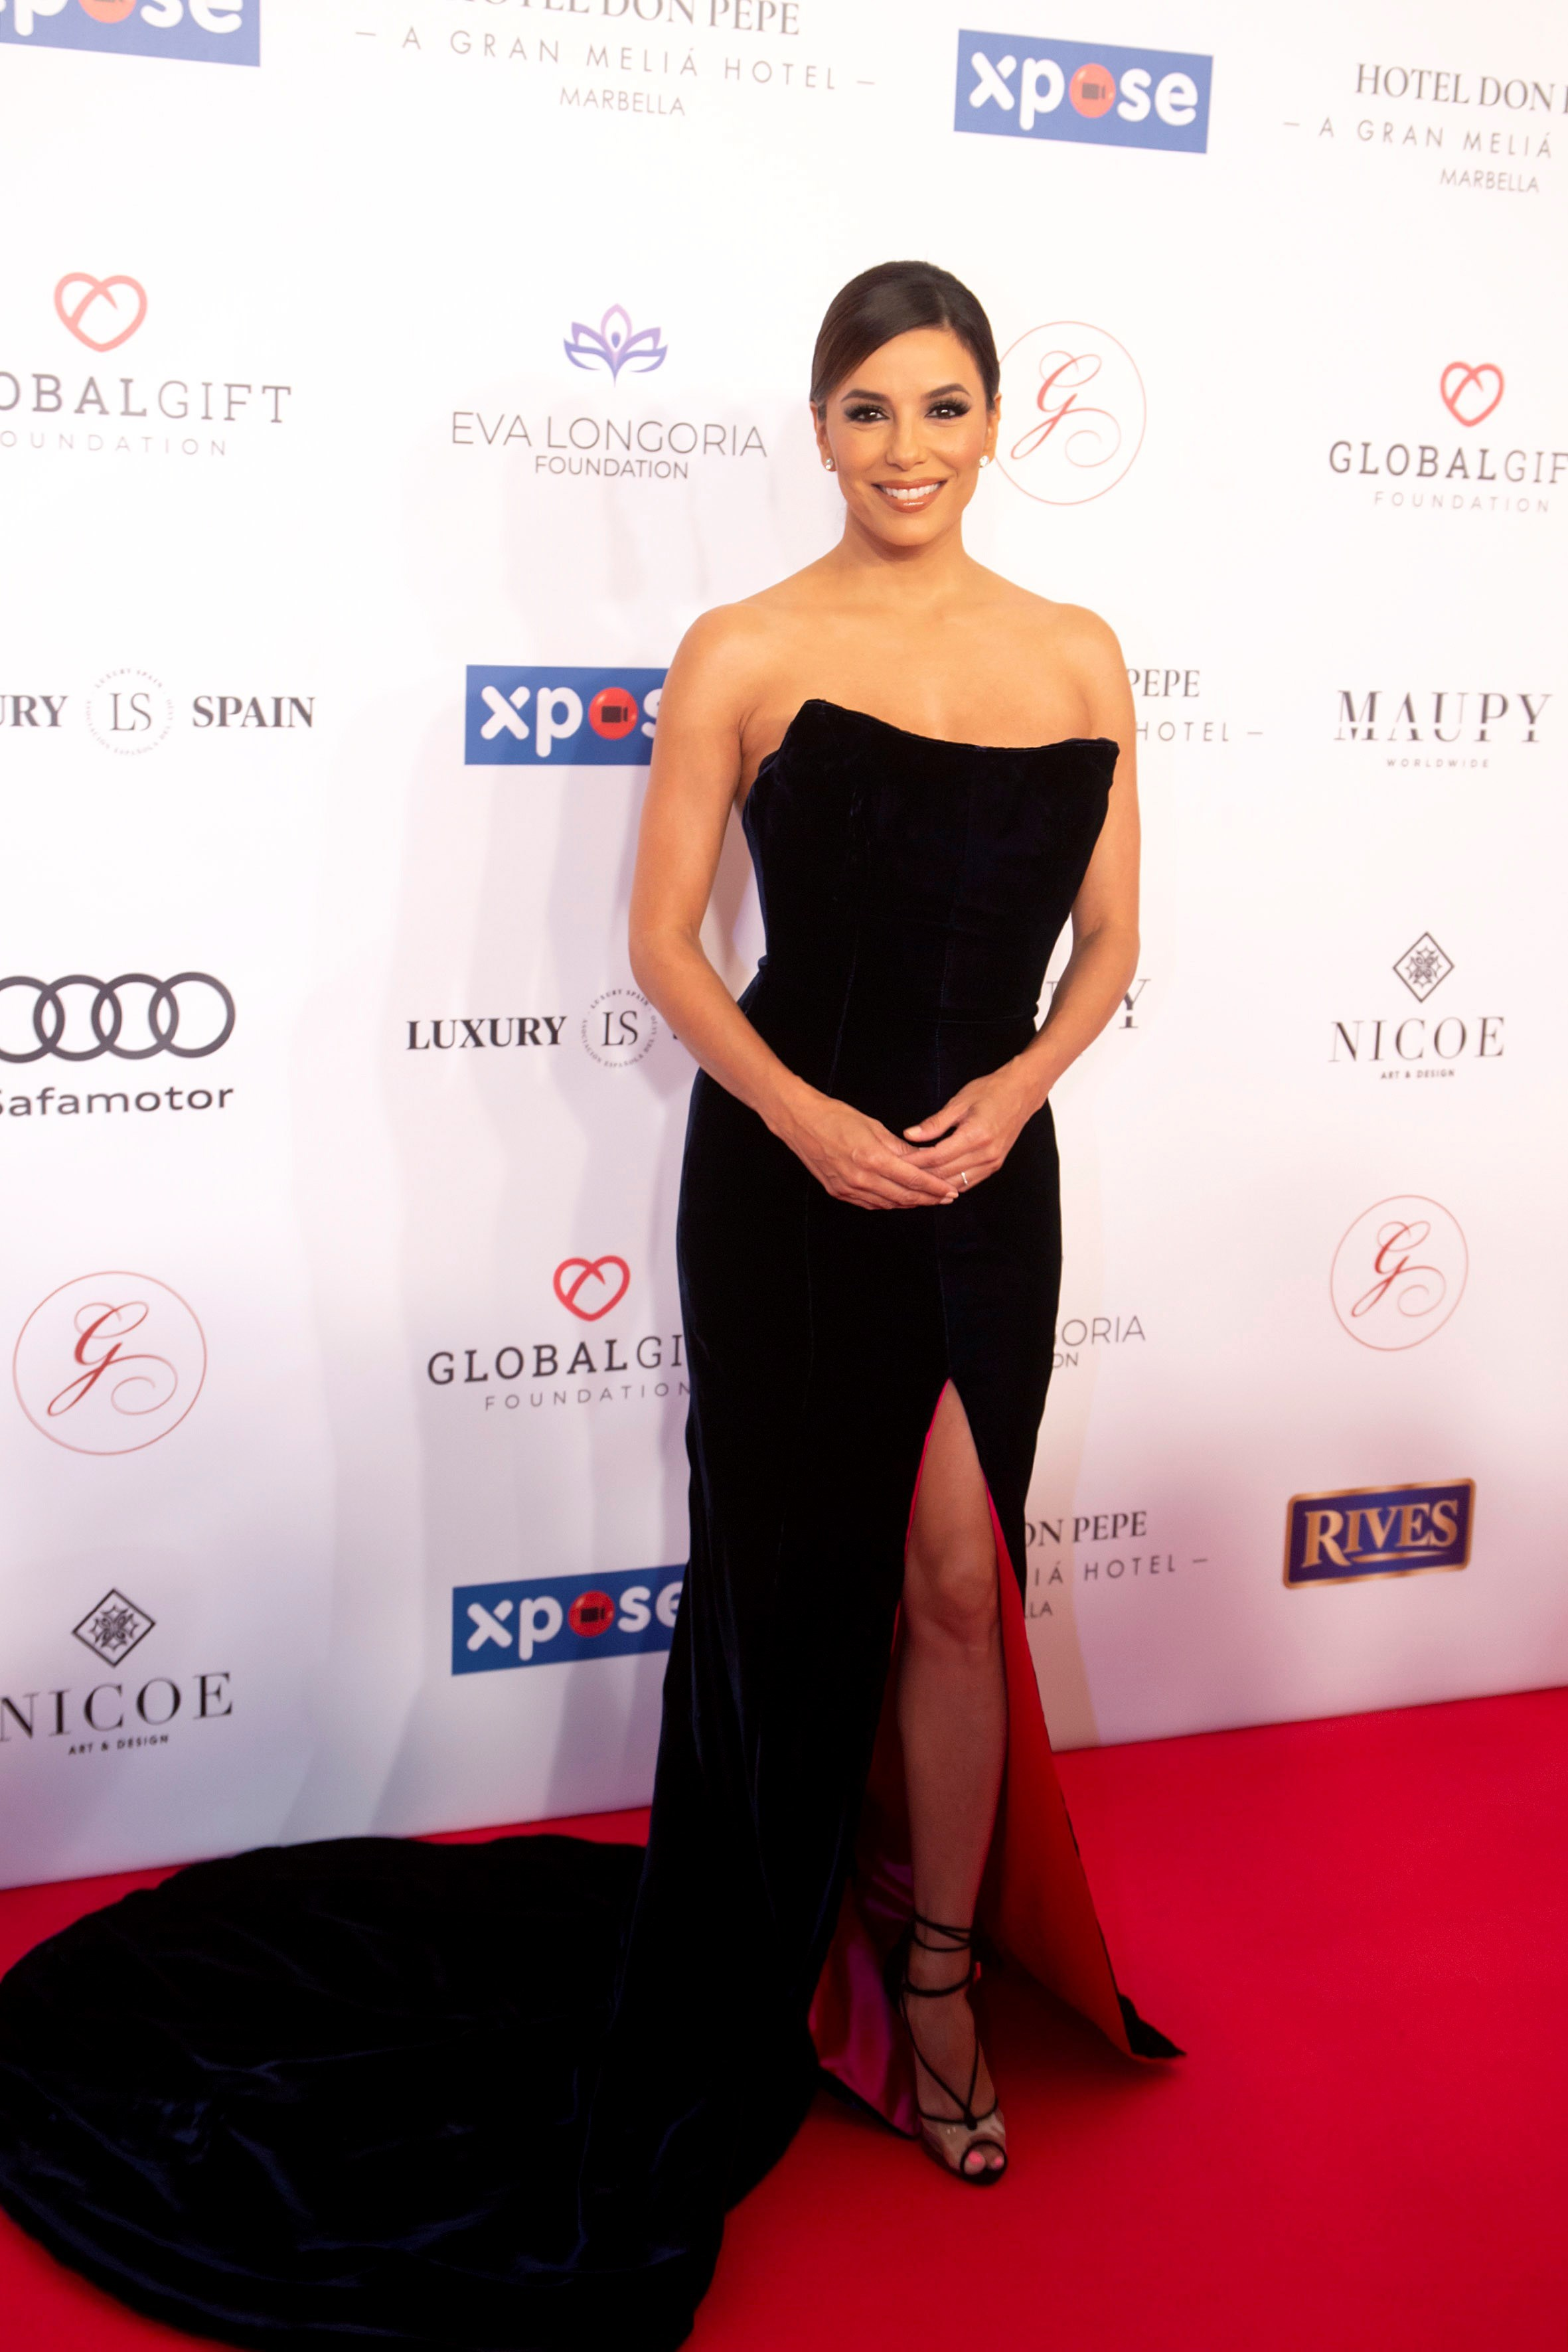 Eva Longoria attends the VIII Global Gift gala in Marbella, Spain, on July 12, 2019.